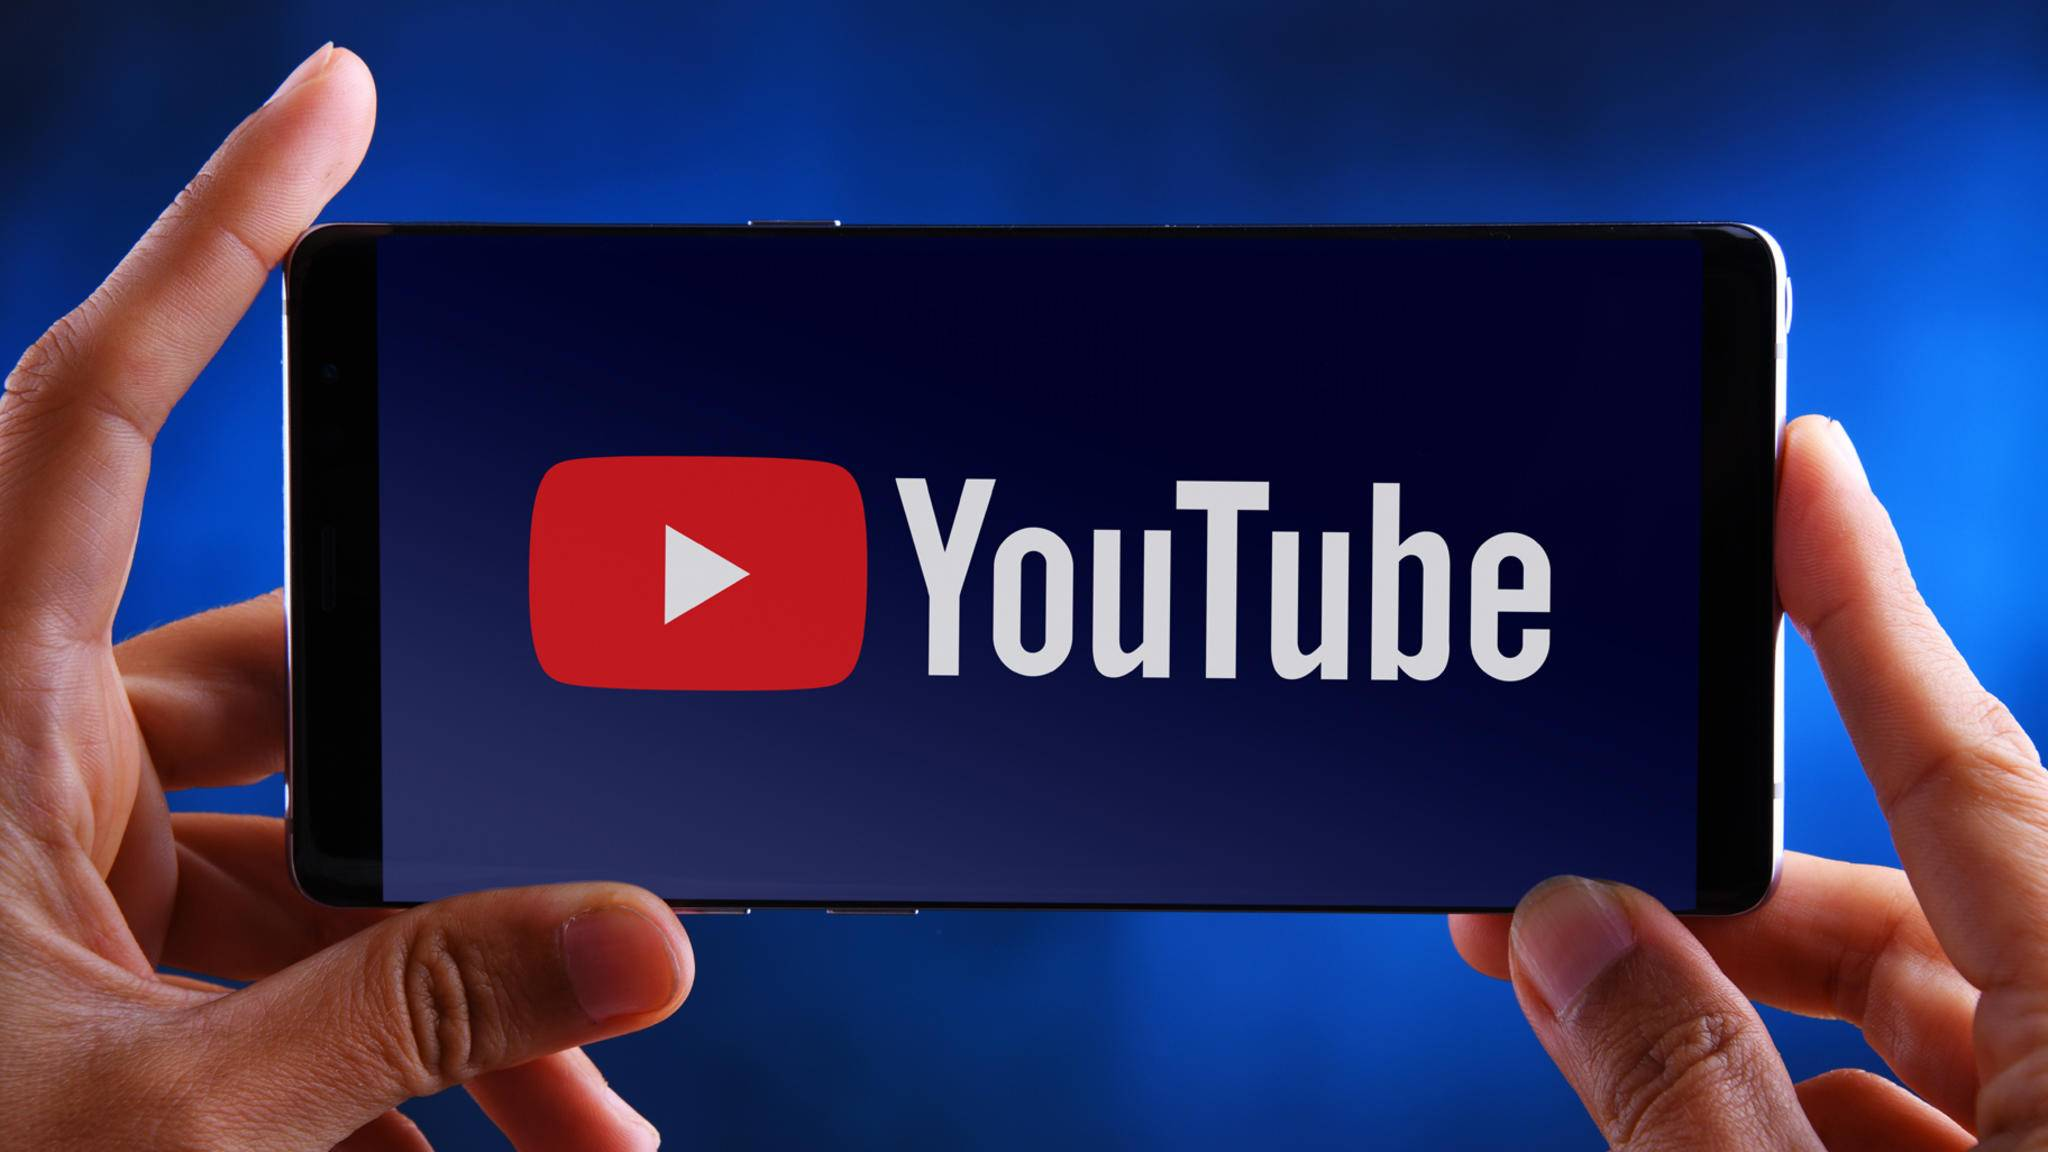 YouTube Logo Display smartphone